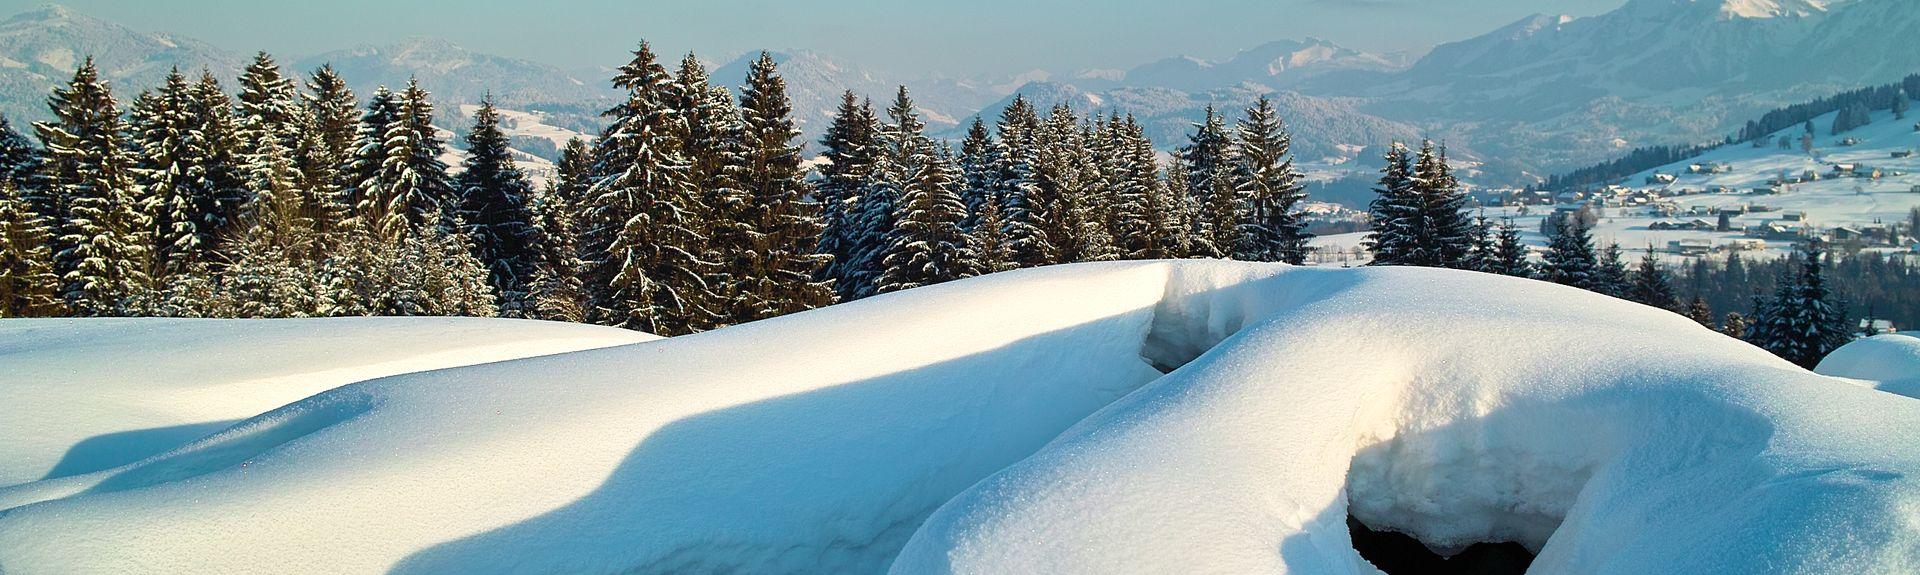 Lochau, Vorarlberg, Oostenrijk